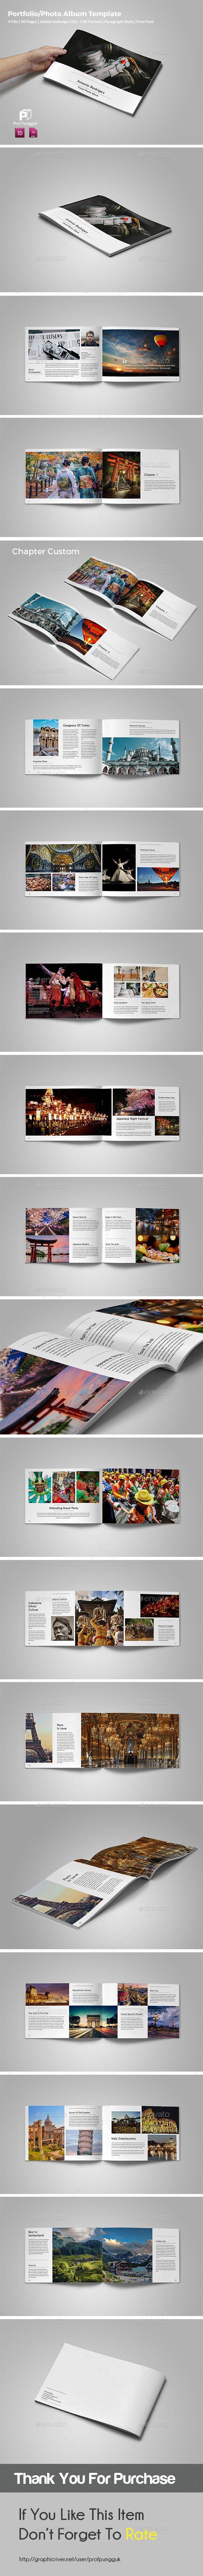 Photography PortfolioPhoto Album landscape vol4 Photo